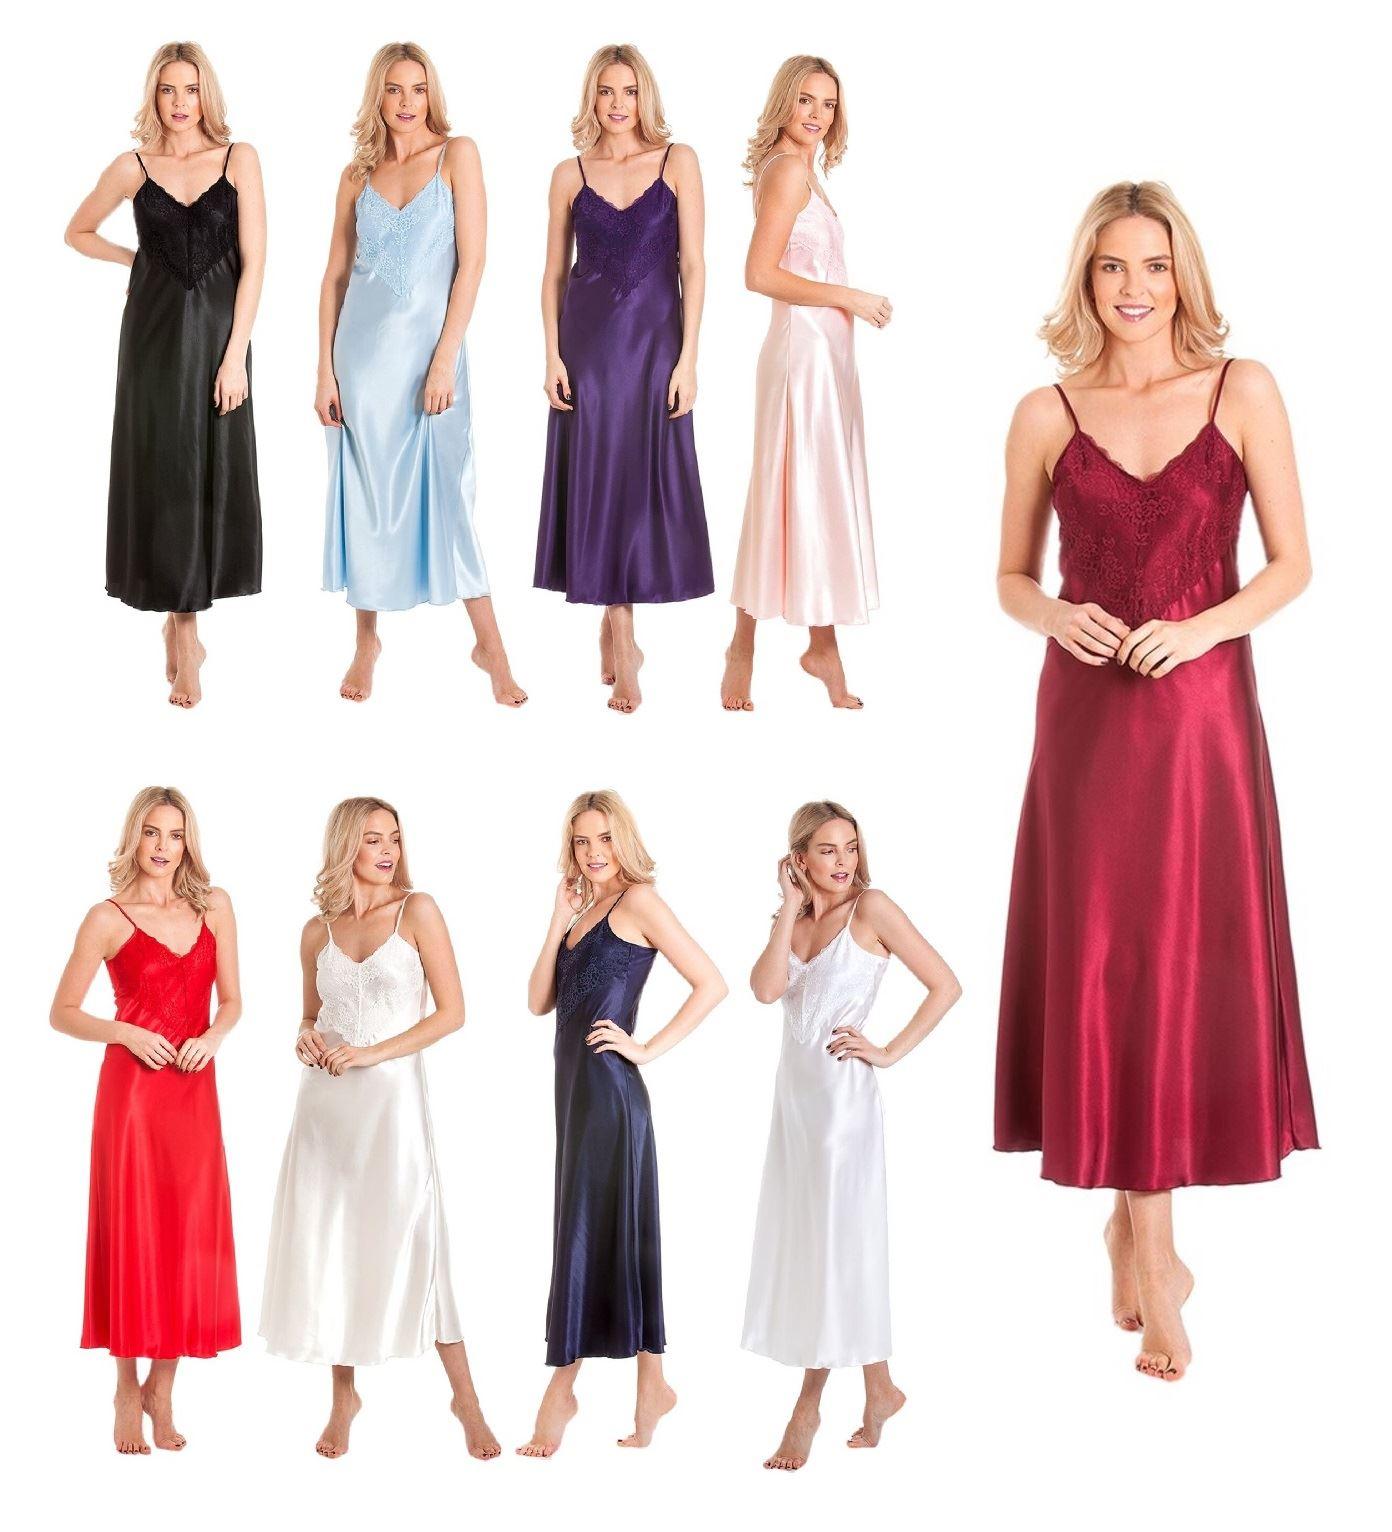 Plus Size Nighties for Women | Long Nighties | Fashion World